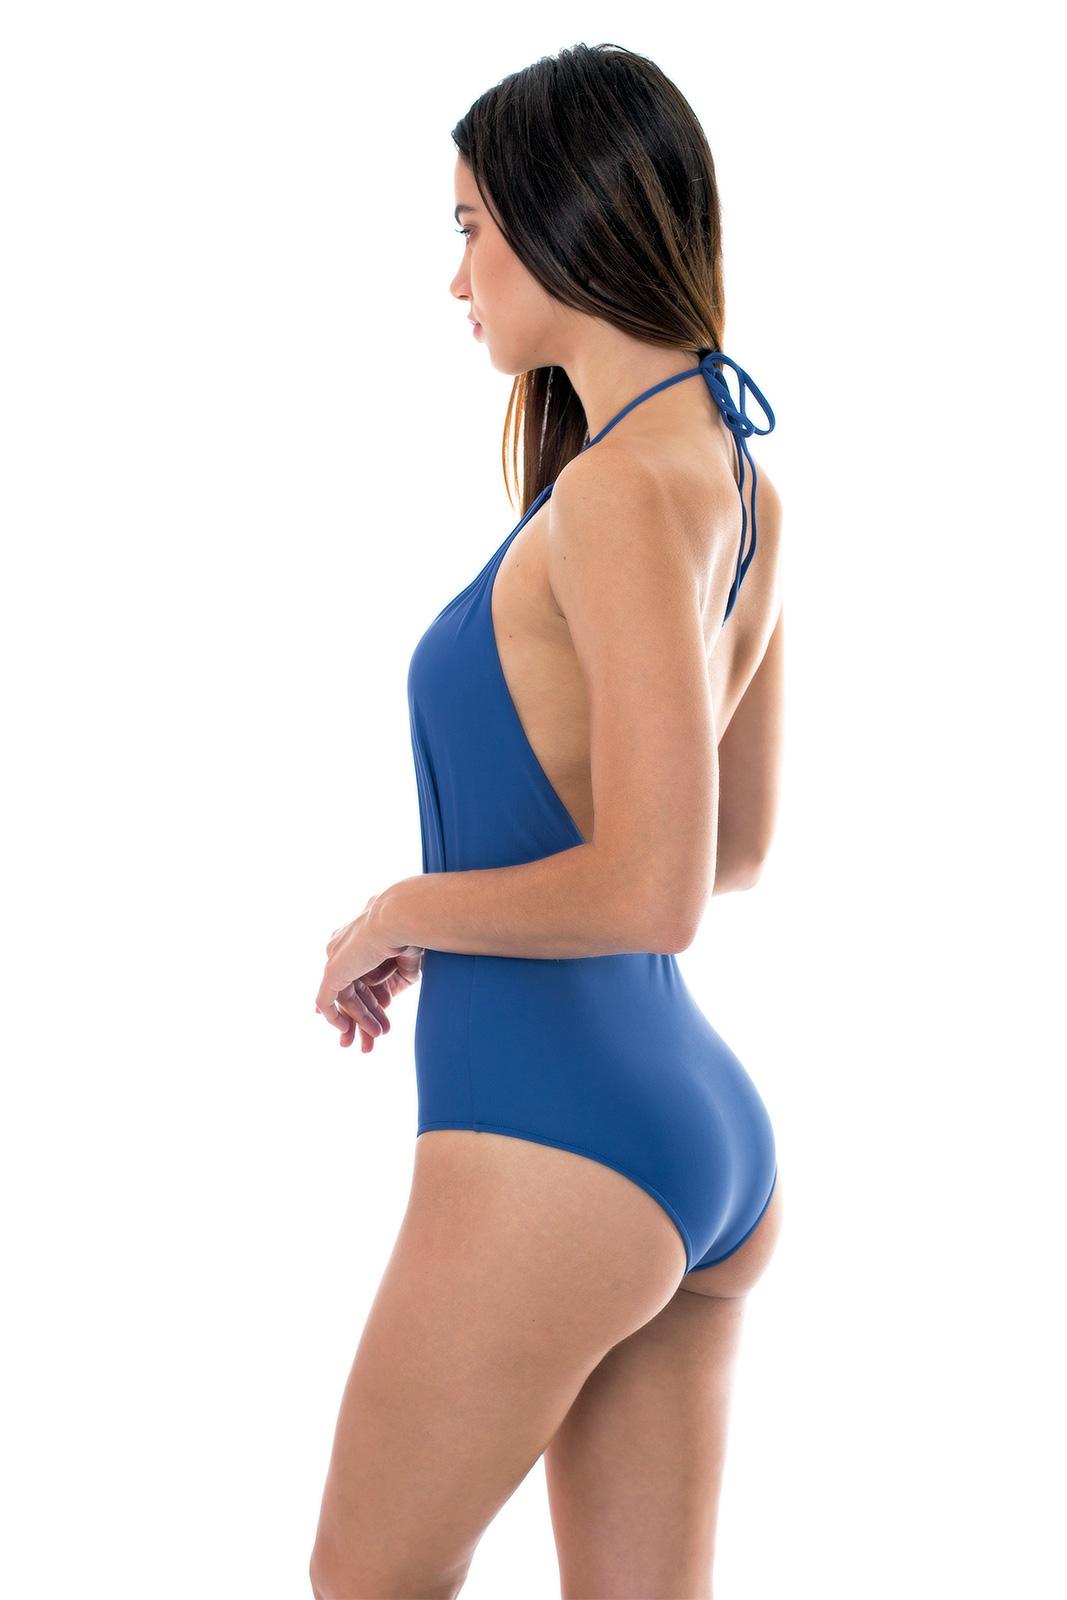 347f59a18f2ec Denim Blue Low-cut 1-piece Swimsuit - Denim Decote Profundo - Rio de Sol